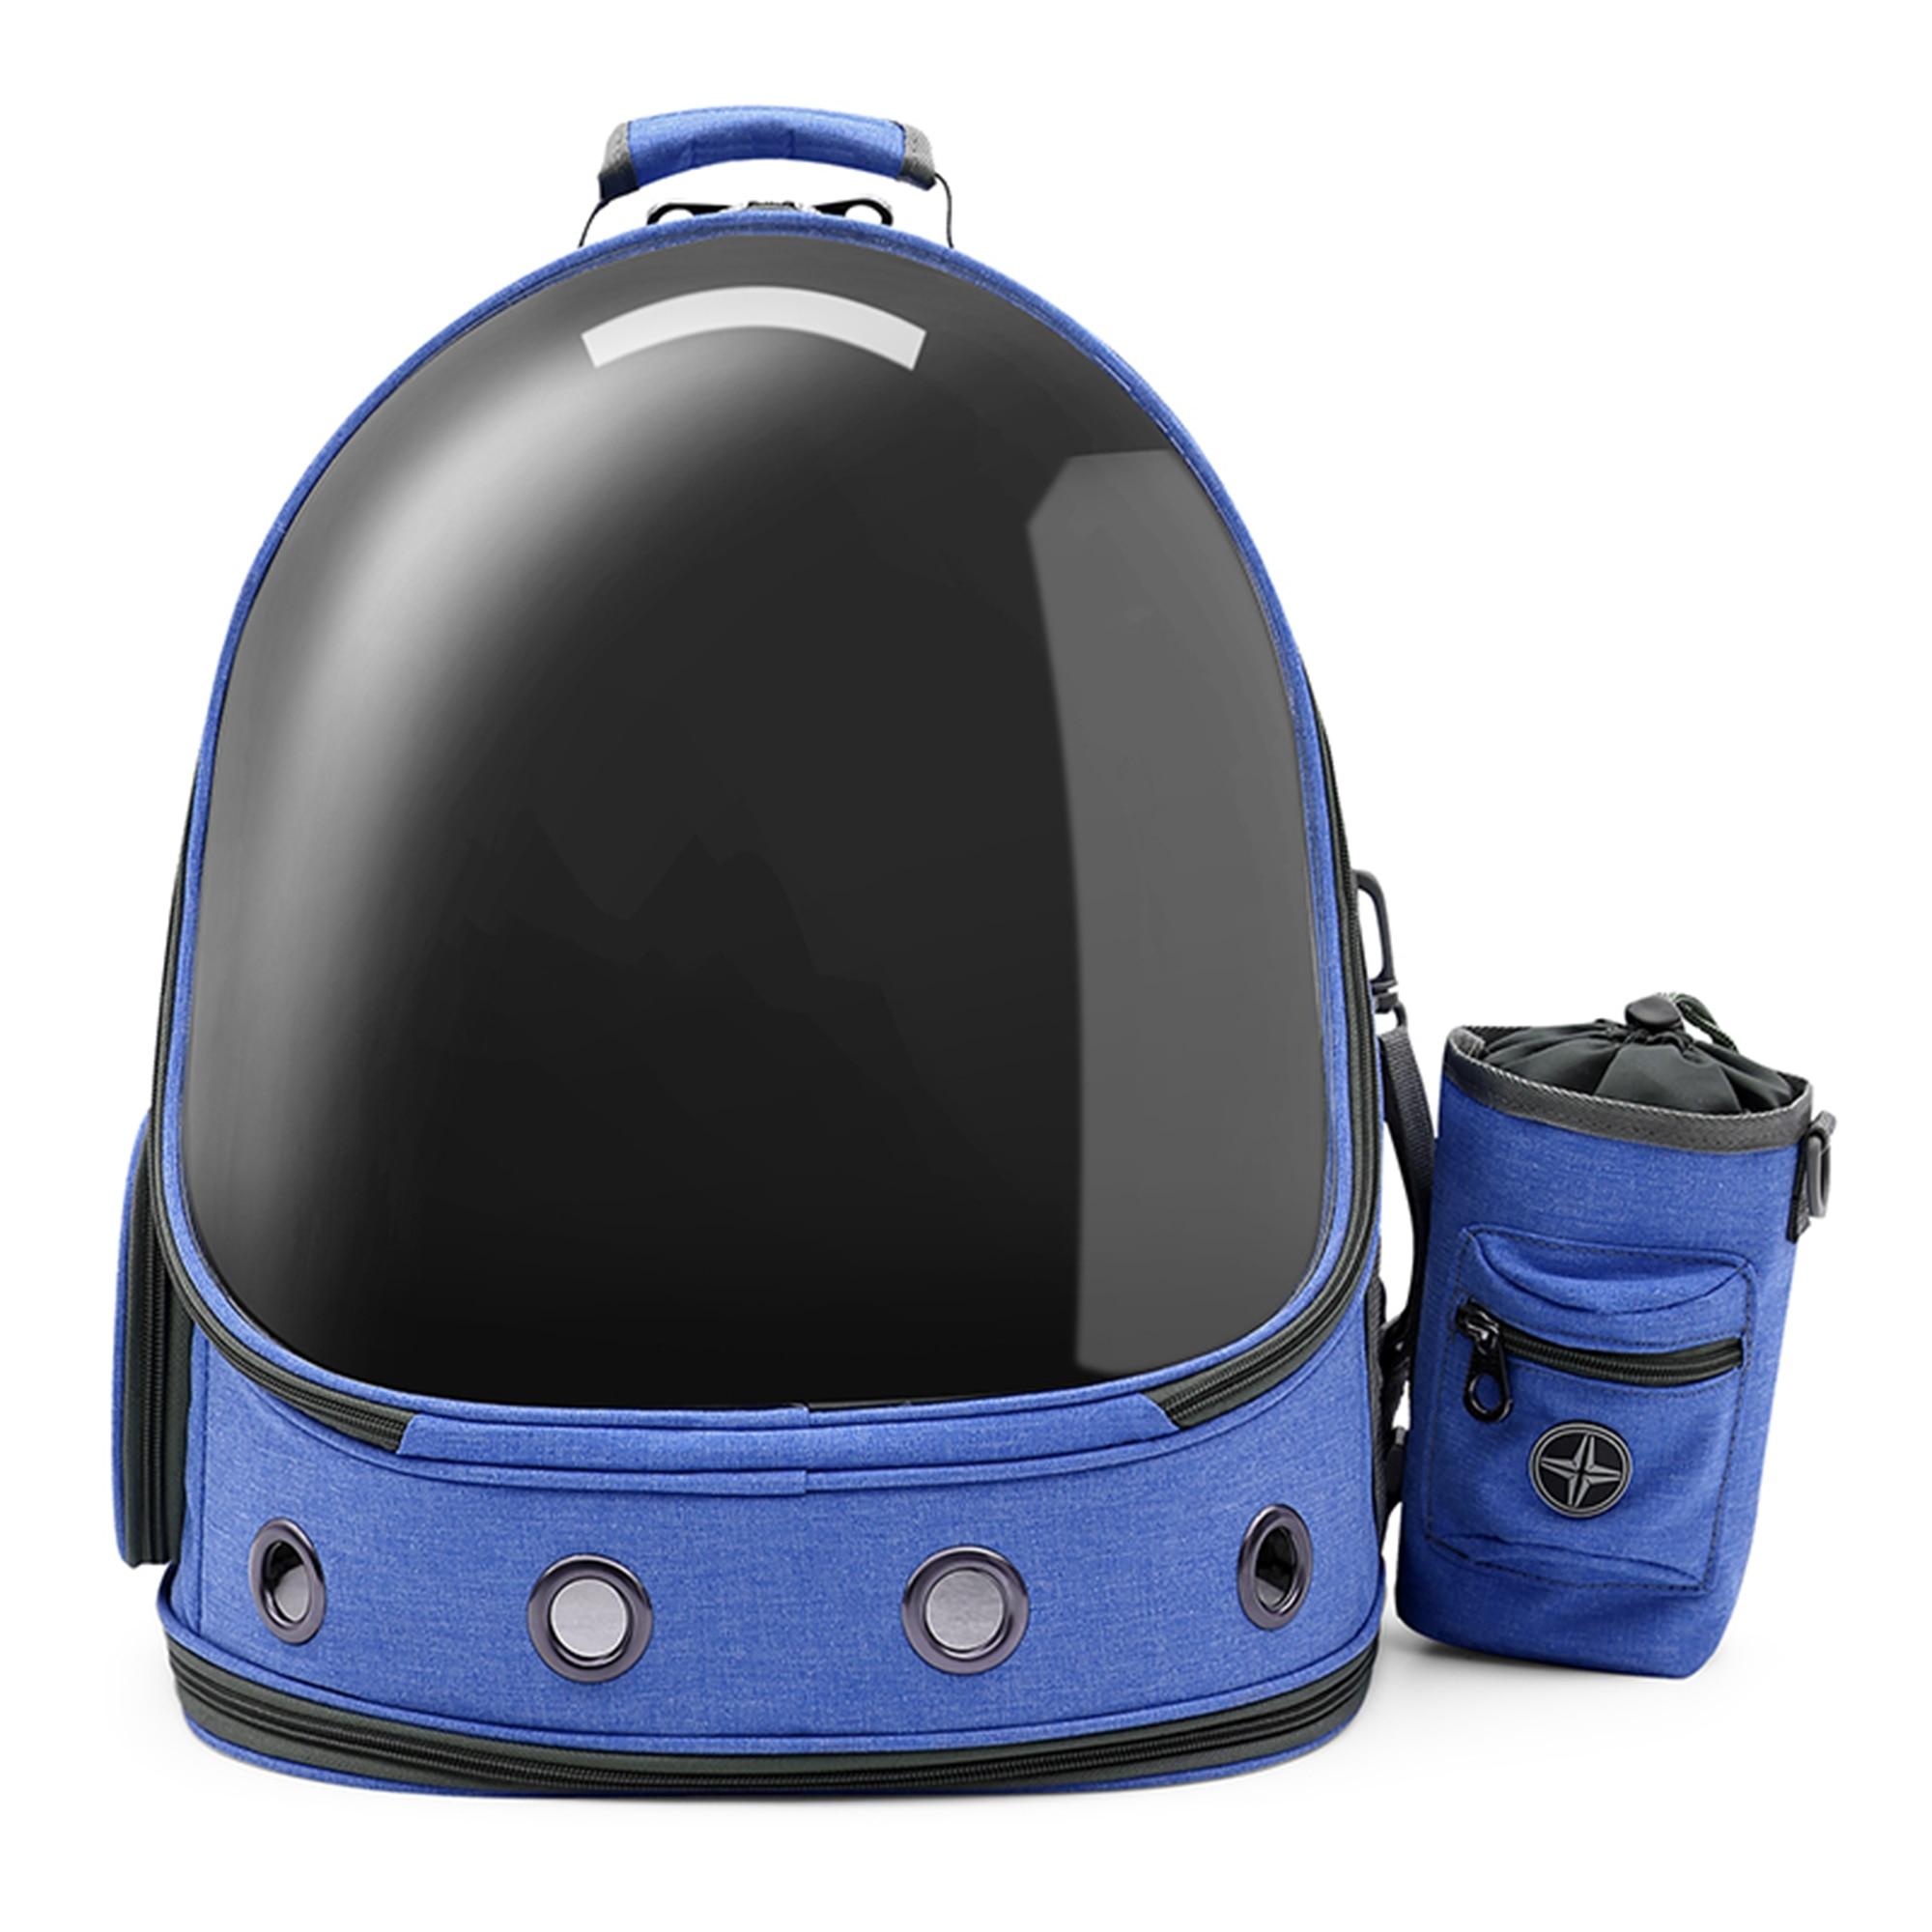 Fotografie Rucsac transport animale de companie de talie mica si medie, TOGO, Albastru, material textil, 37x28x41 cm